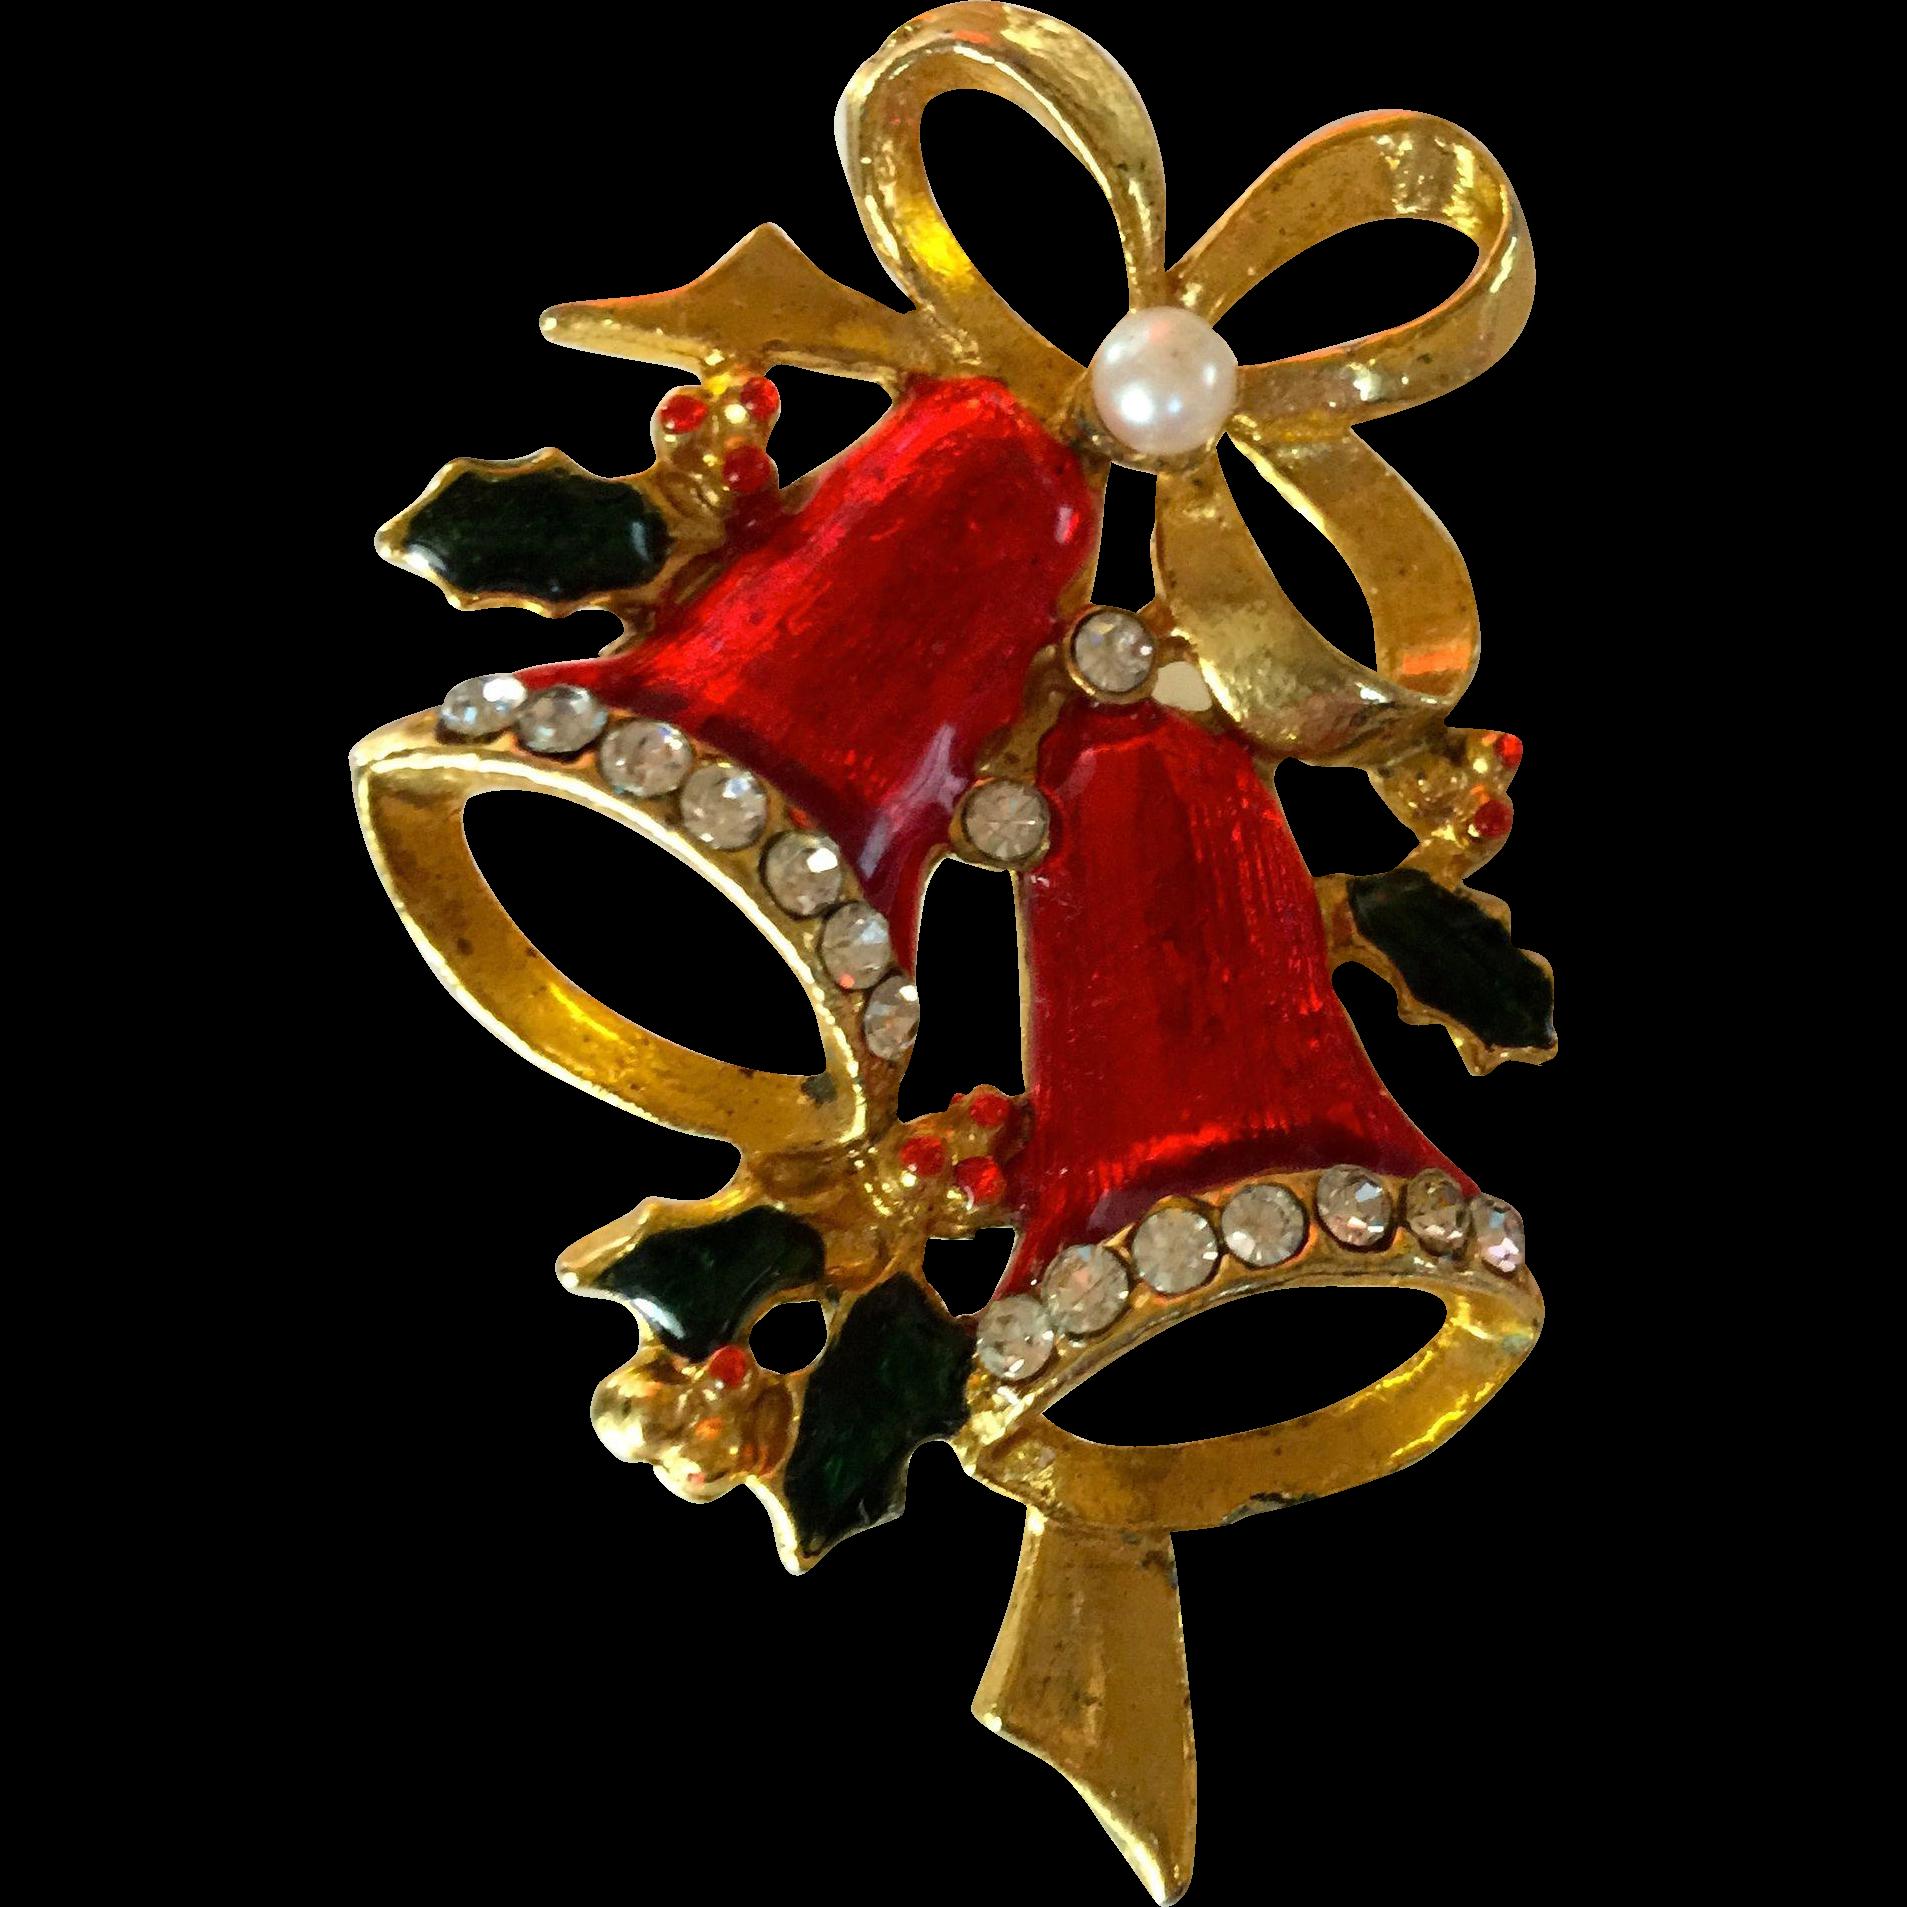 Jingle Bell Red Enamel Christmas Pin Found At Www Rubylane Com Vintagebeginshere Christmas Christmas Pins Christmas Art Christmas Jewerly